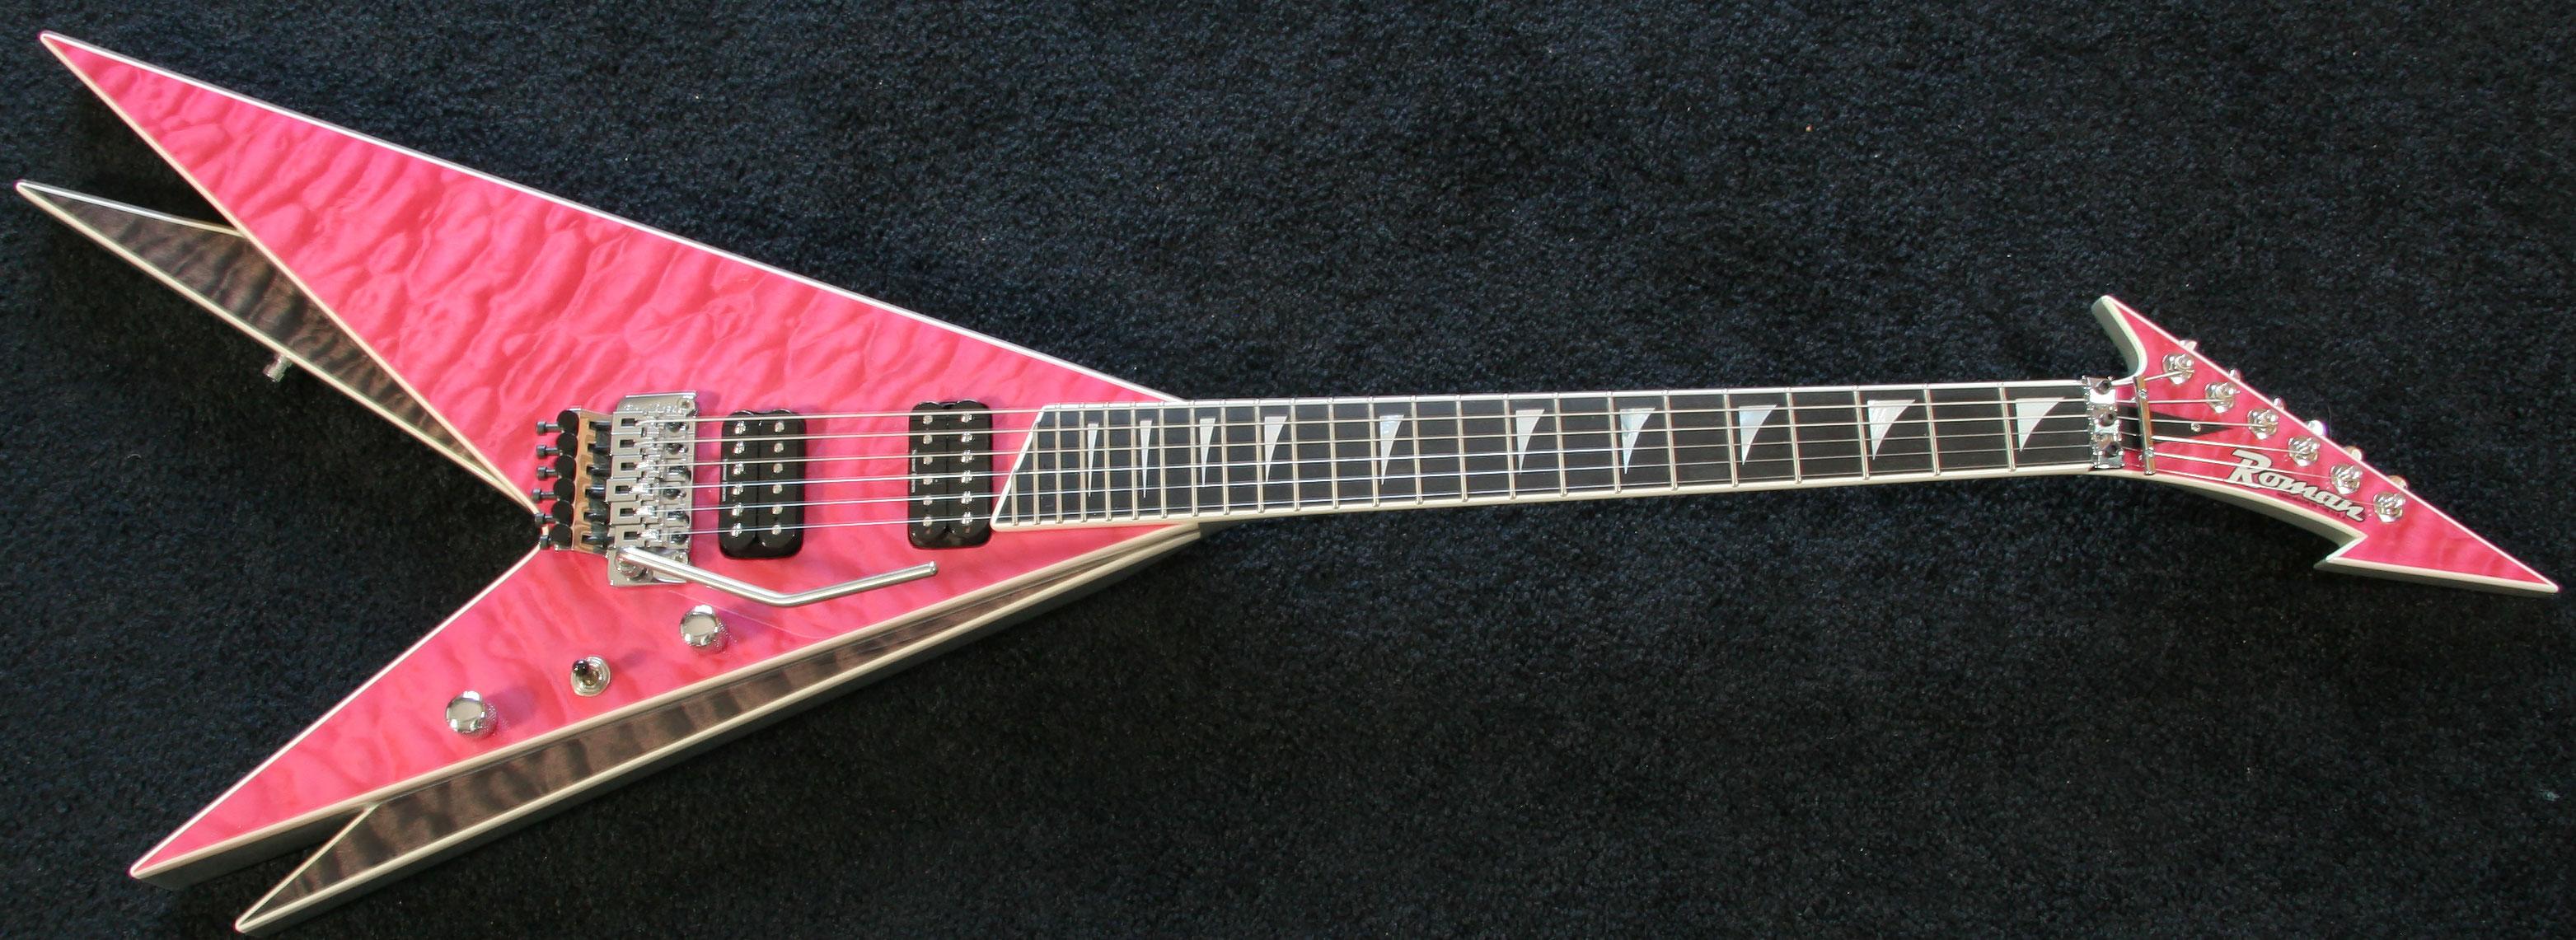 pink-vinnie-vincent.jpg